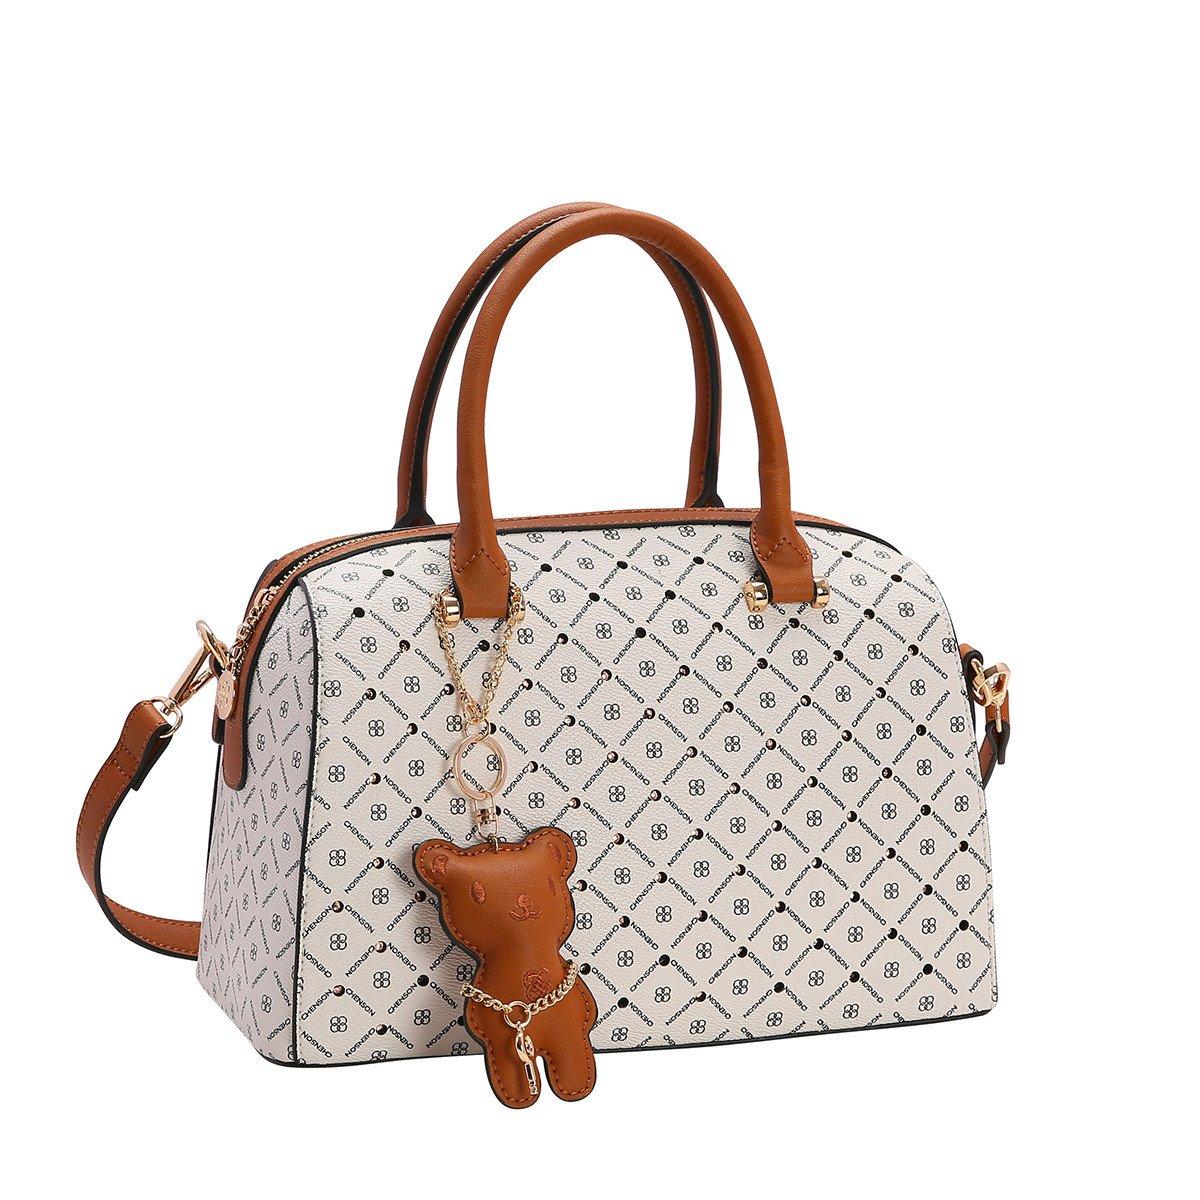 Bolsa Feminina Bau Chenson Monograma Star 3482736 Branco Godiva Calcados